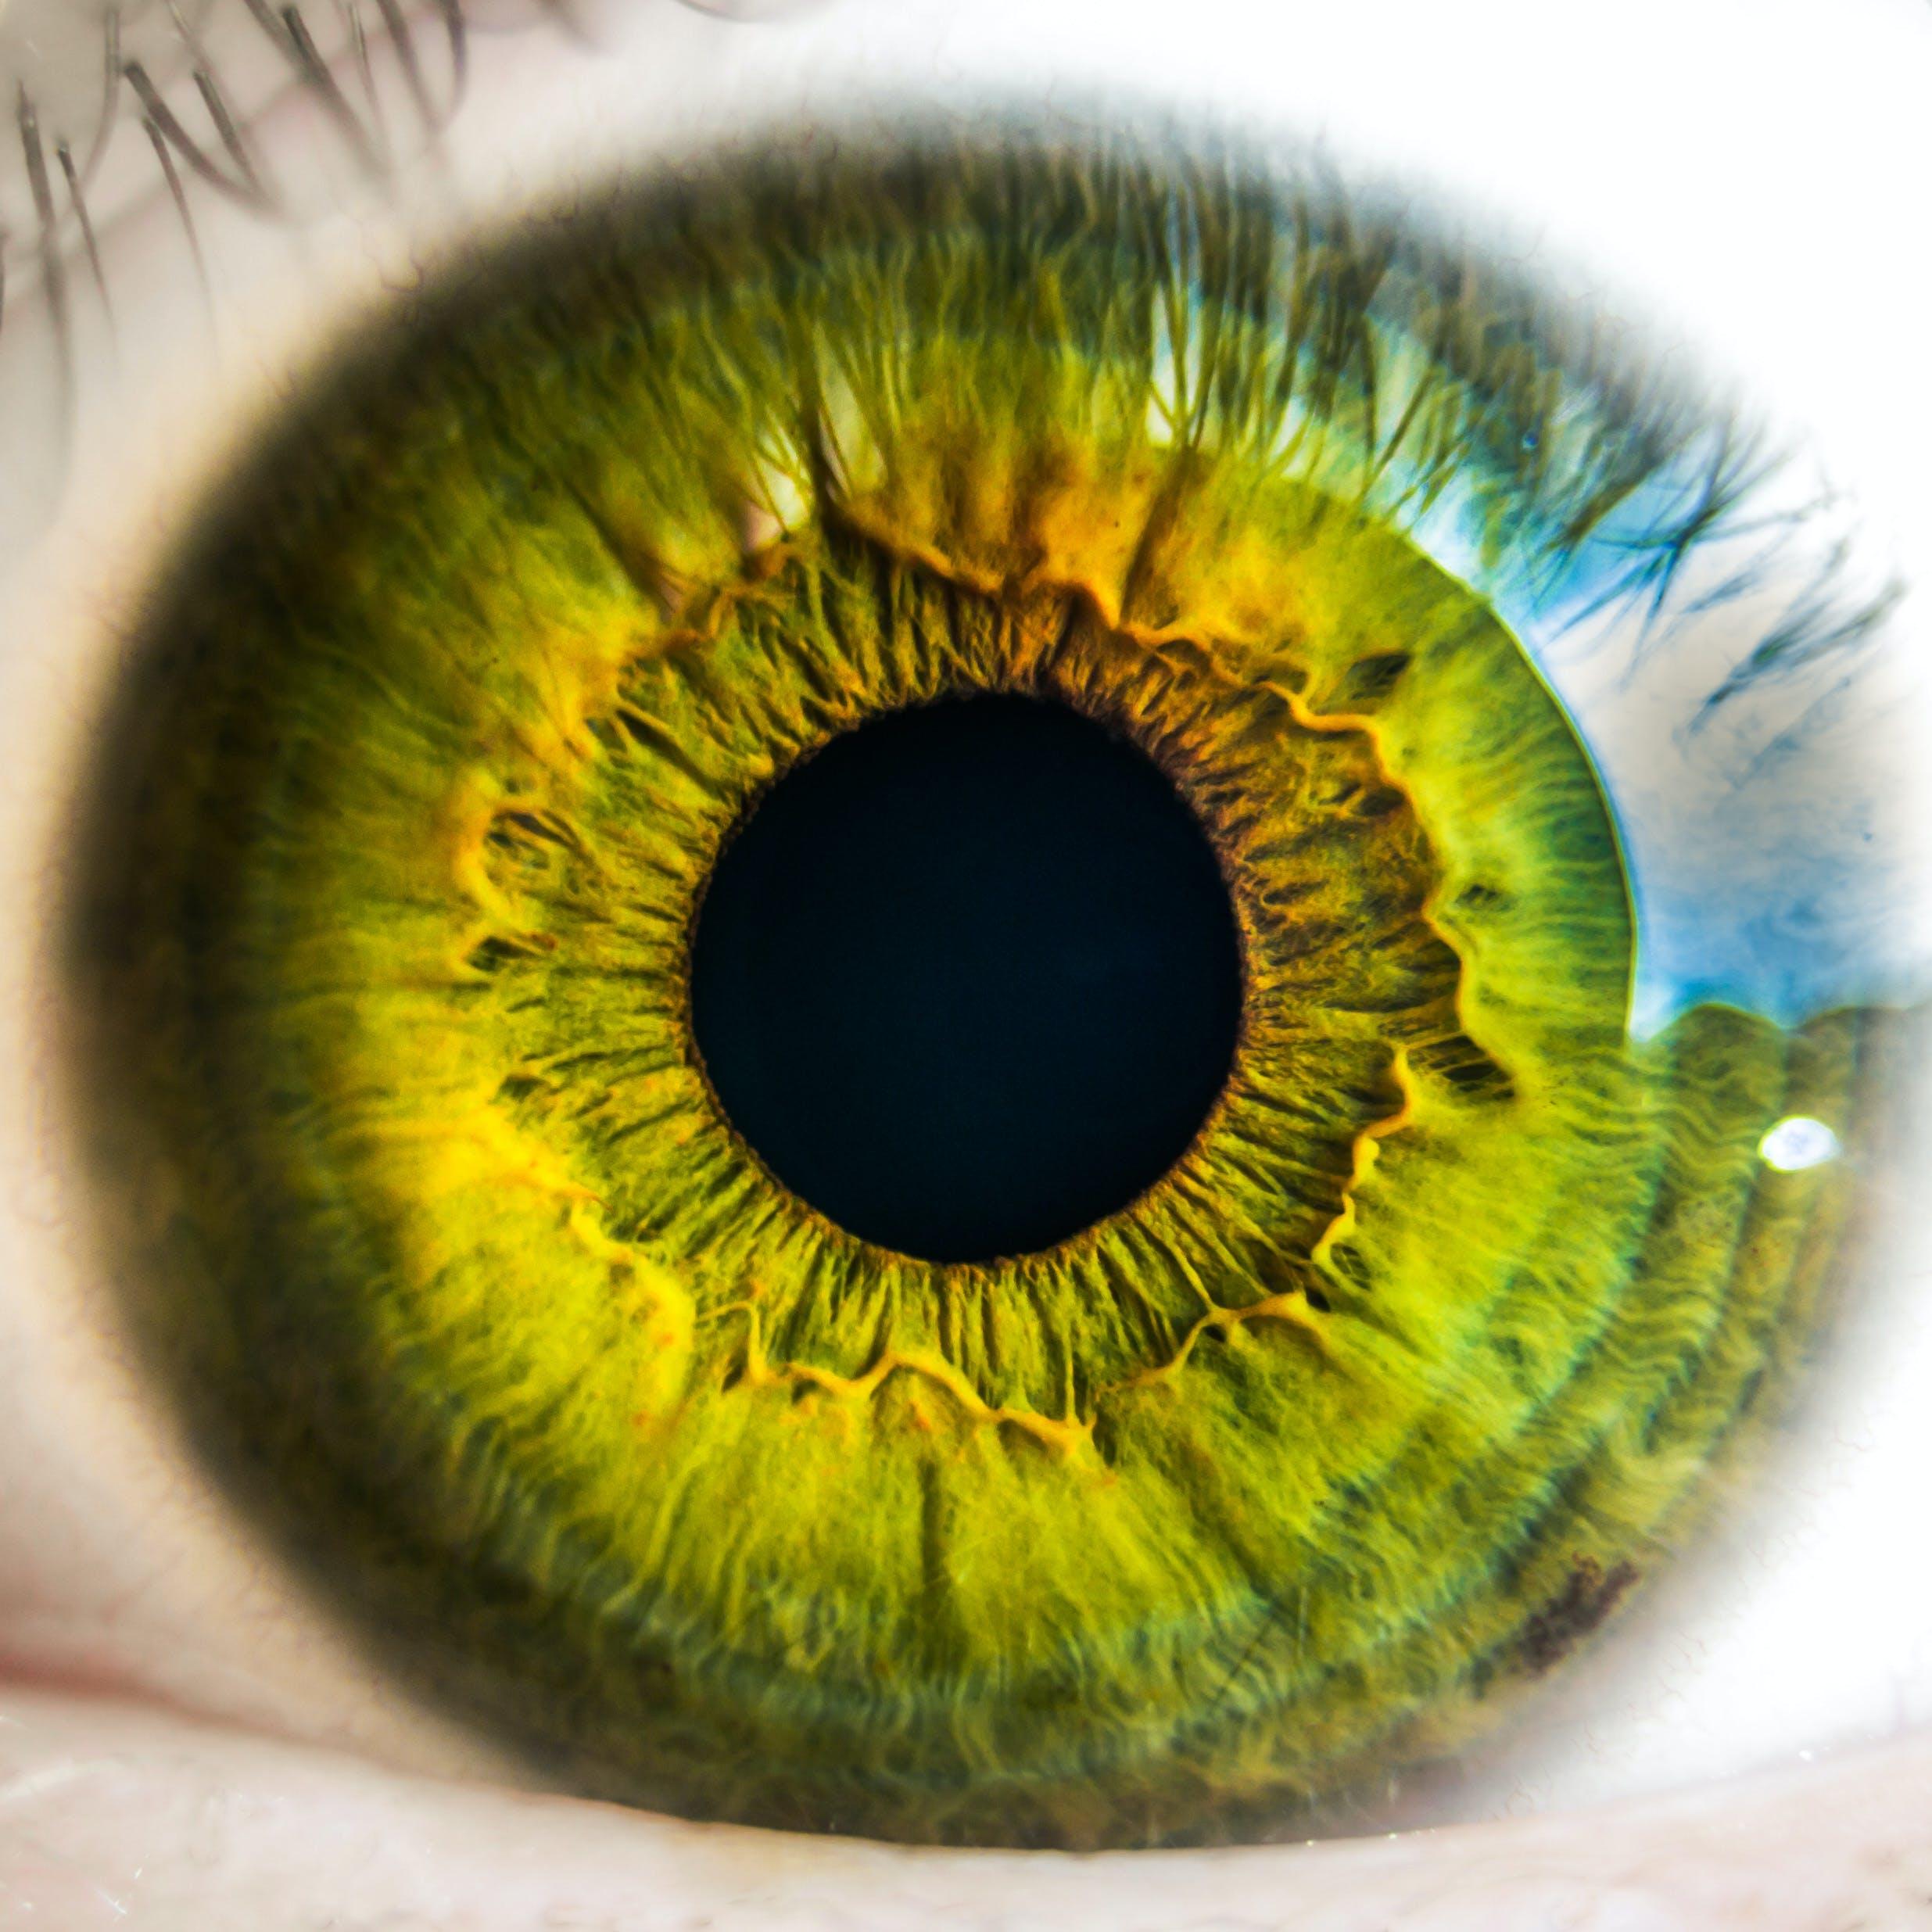 Person's Green Eye